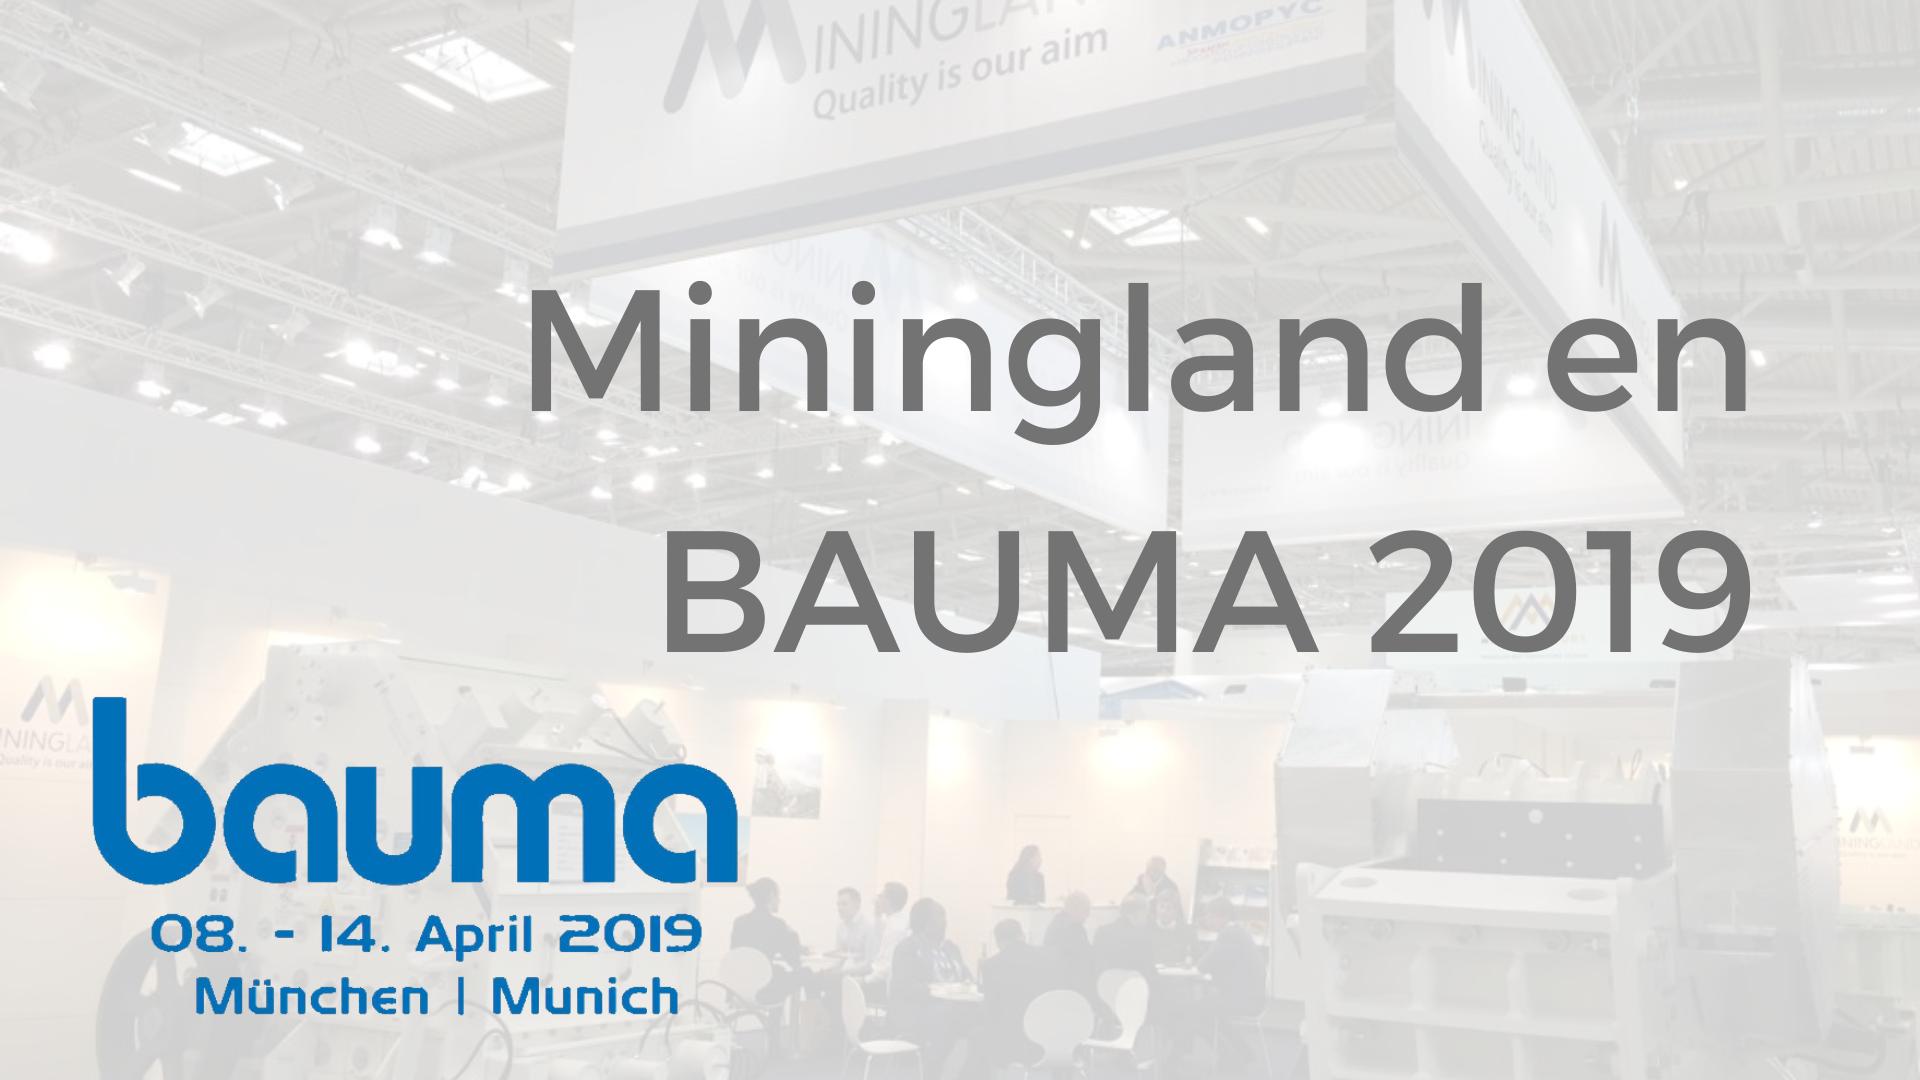 Miningland bauma 2019